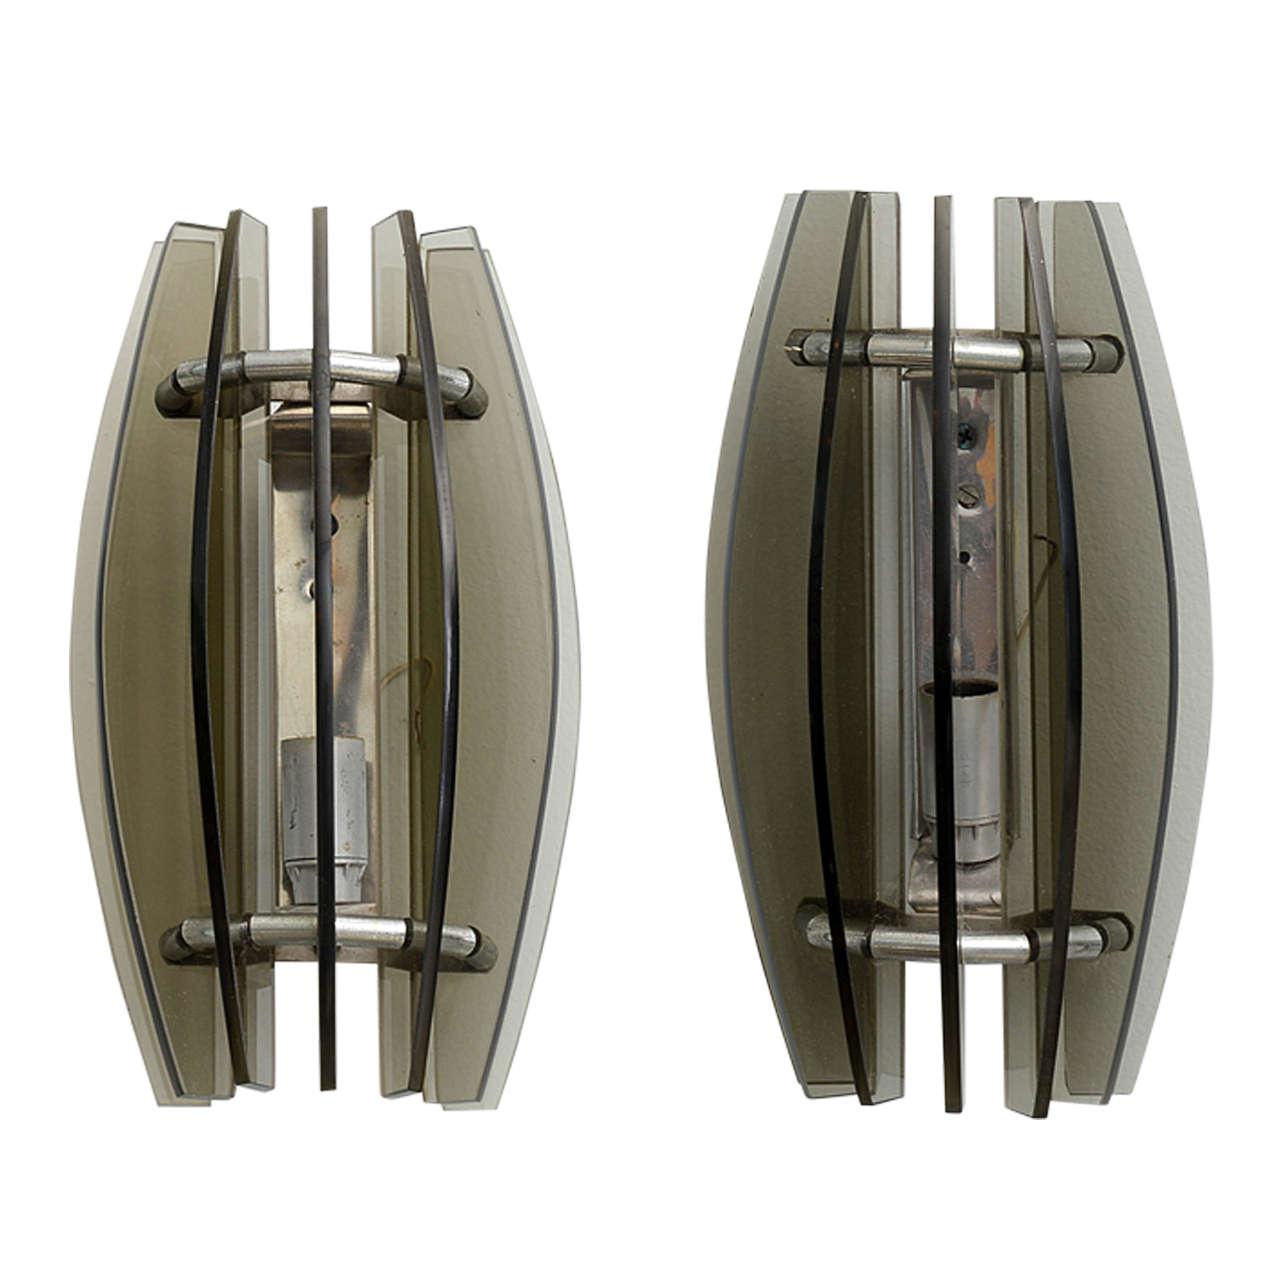 fontana arte lighting. pair of italian modern smoked glass wall lights, manner fontana arte 1 lighting